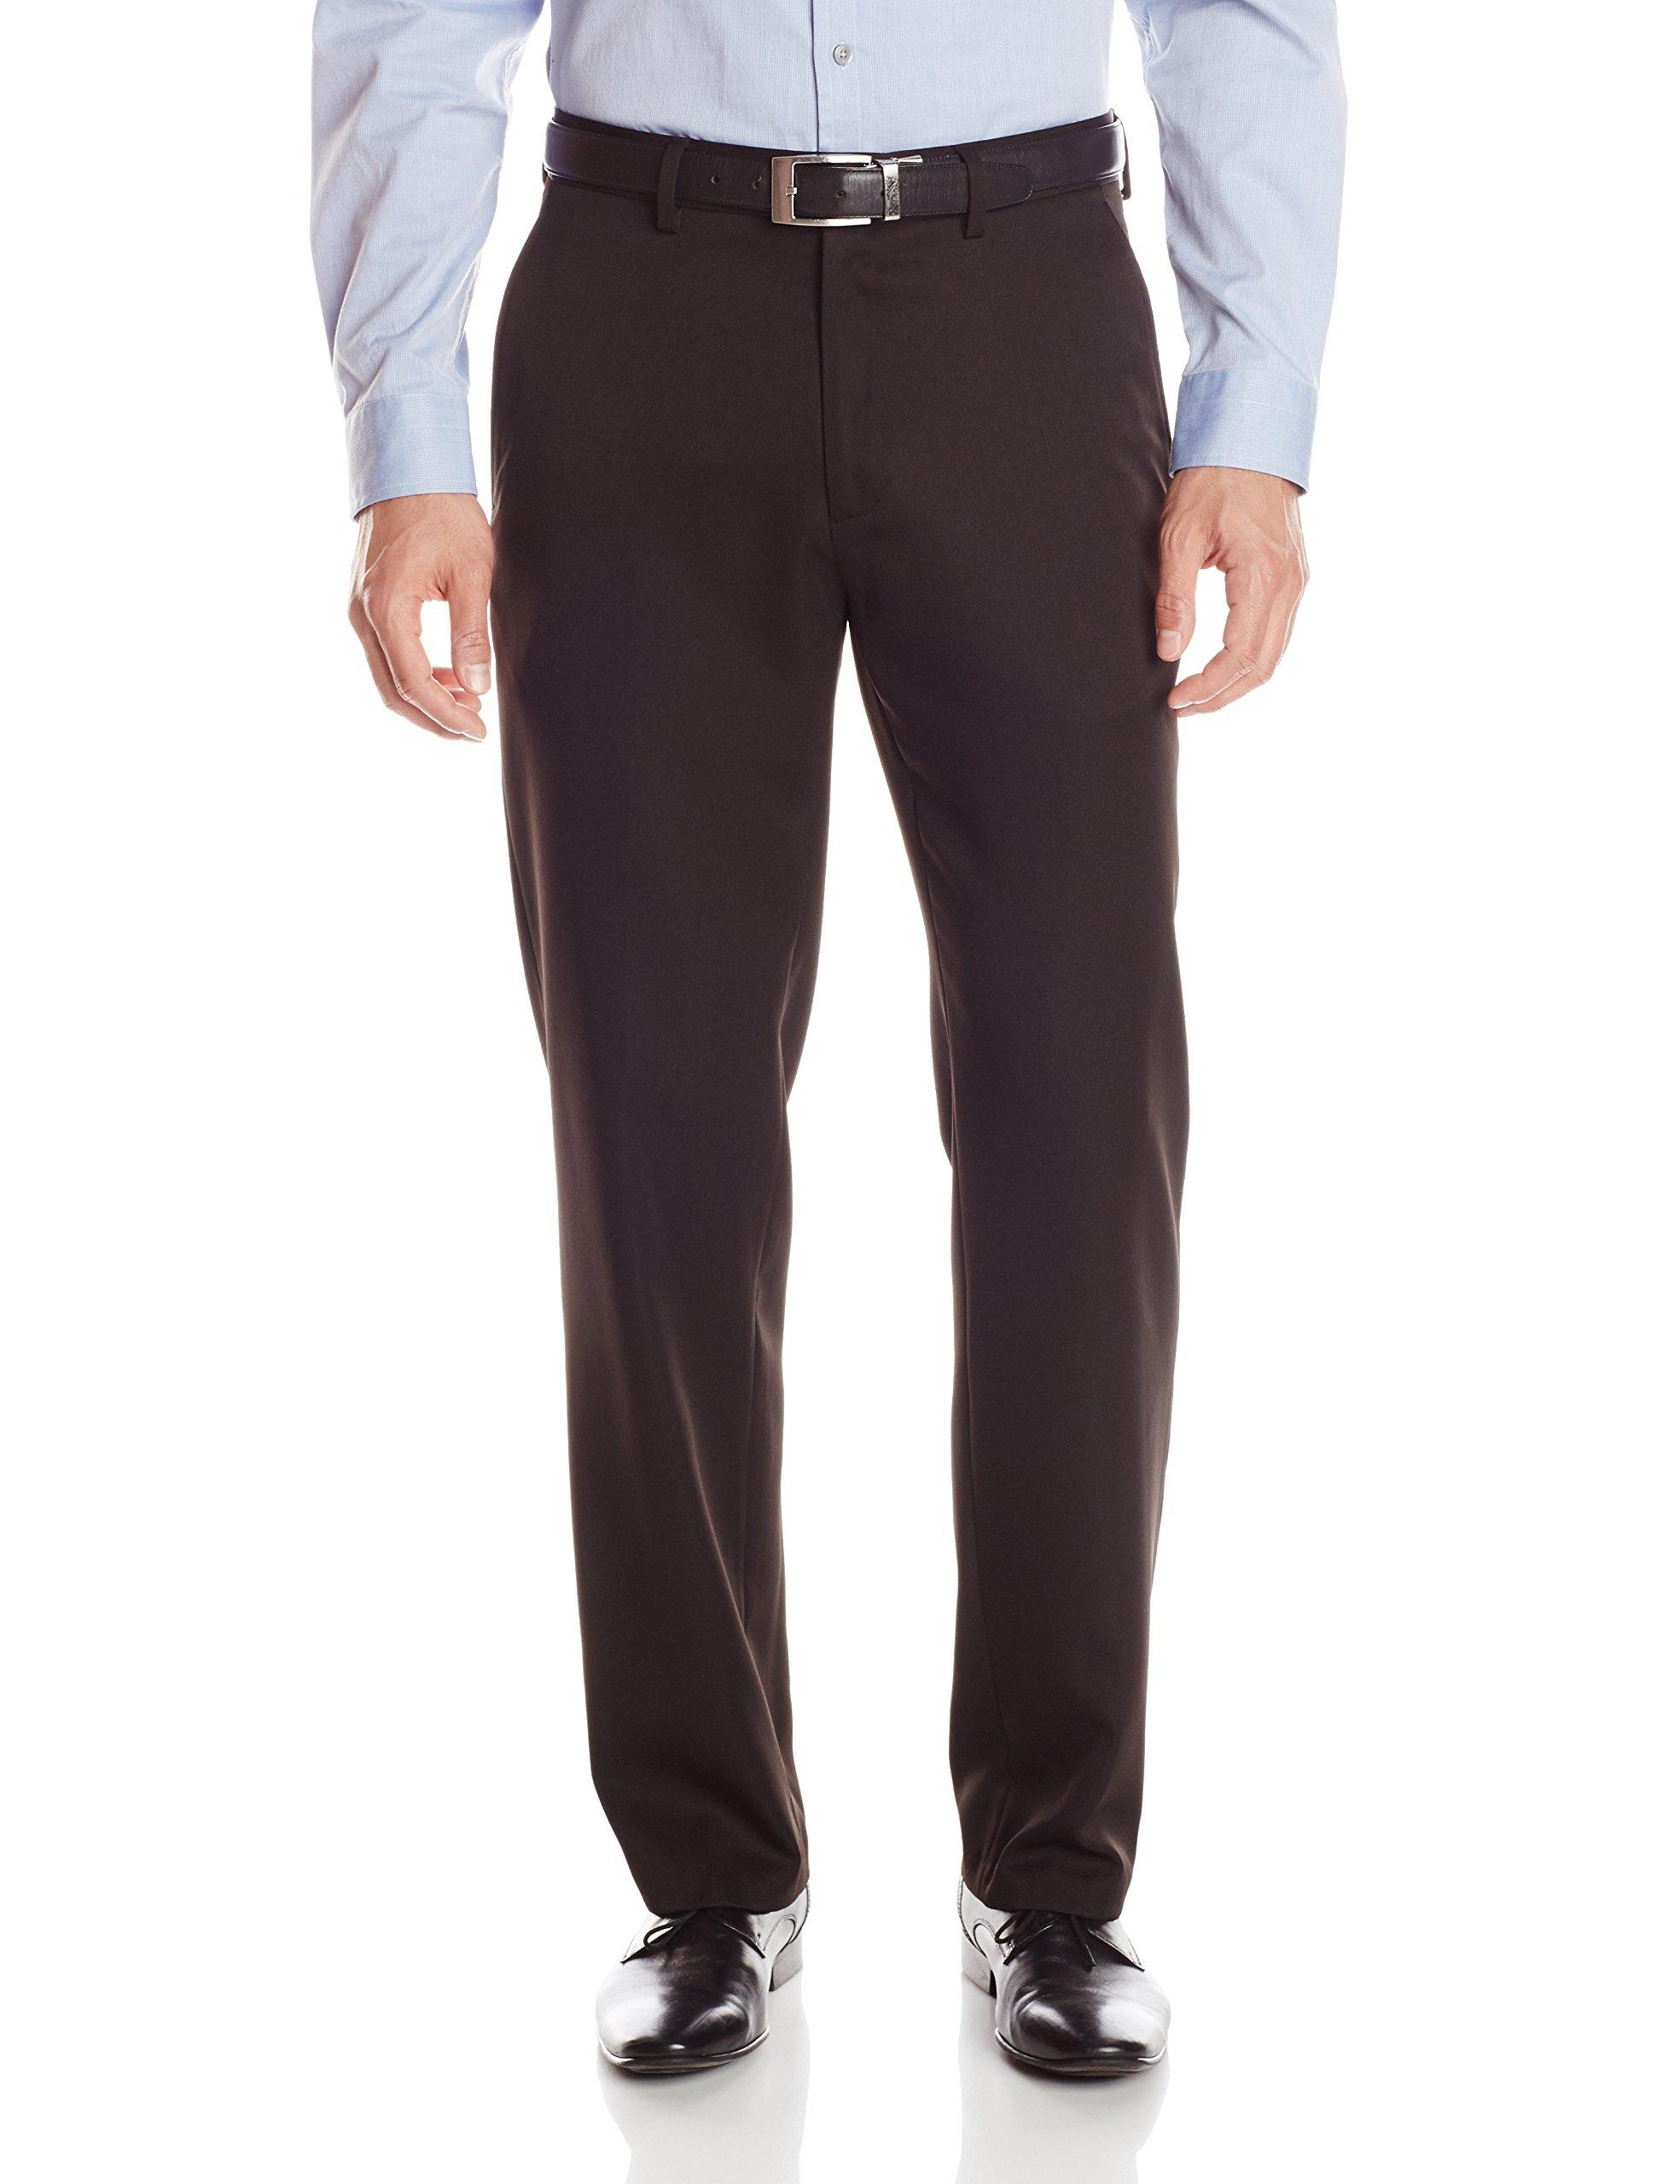 Haggar Men's Performance Solid Gabardine Tailored Fit Plain Front Suit Separate Pant, Black, 34Wx34L